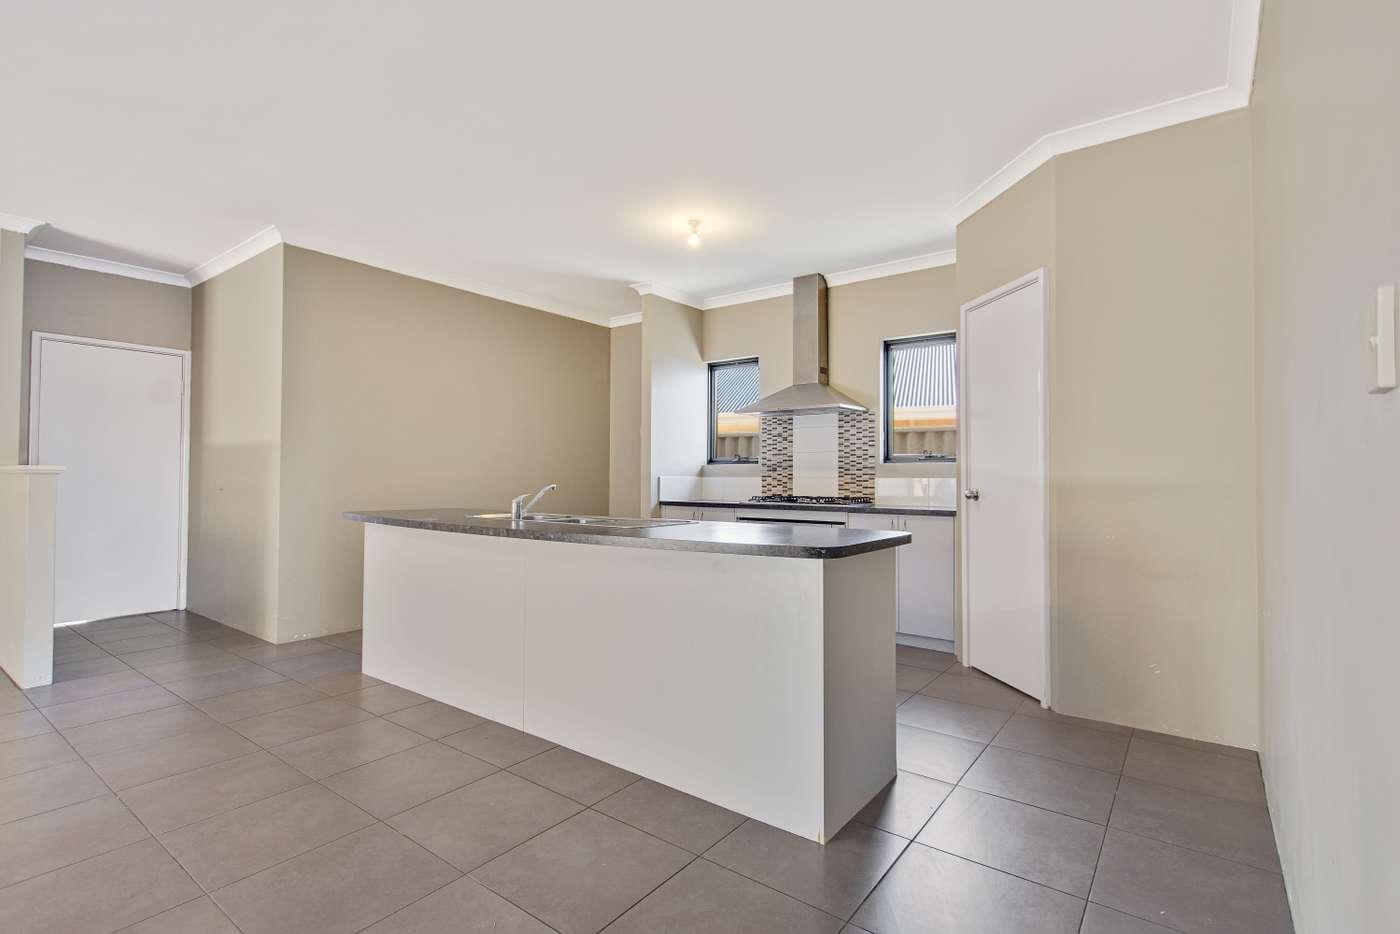 Sixth view of Homely house listing, 3 Apsley Circle, Millbridge WA 6232